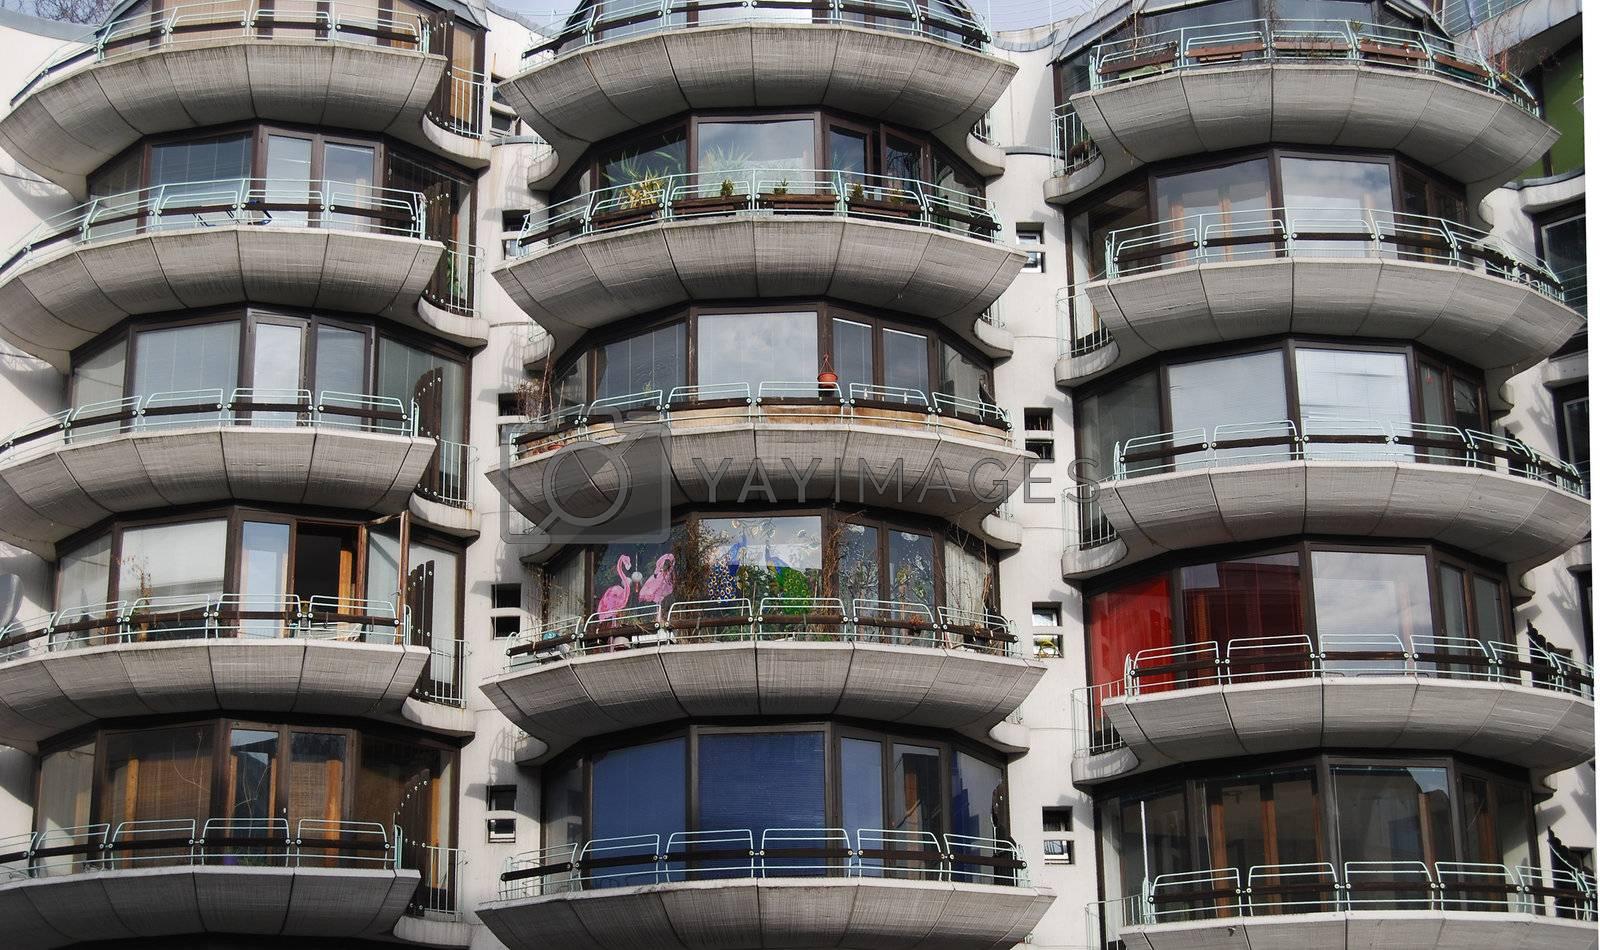 Balcony i Berlin housingcomplex